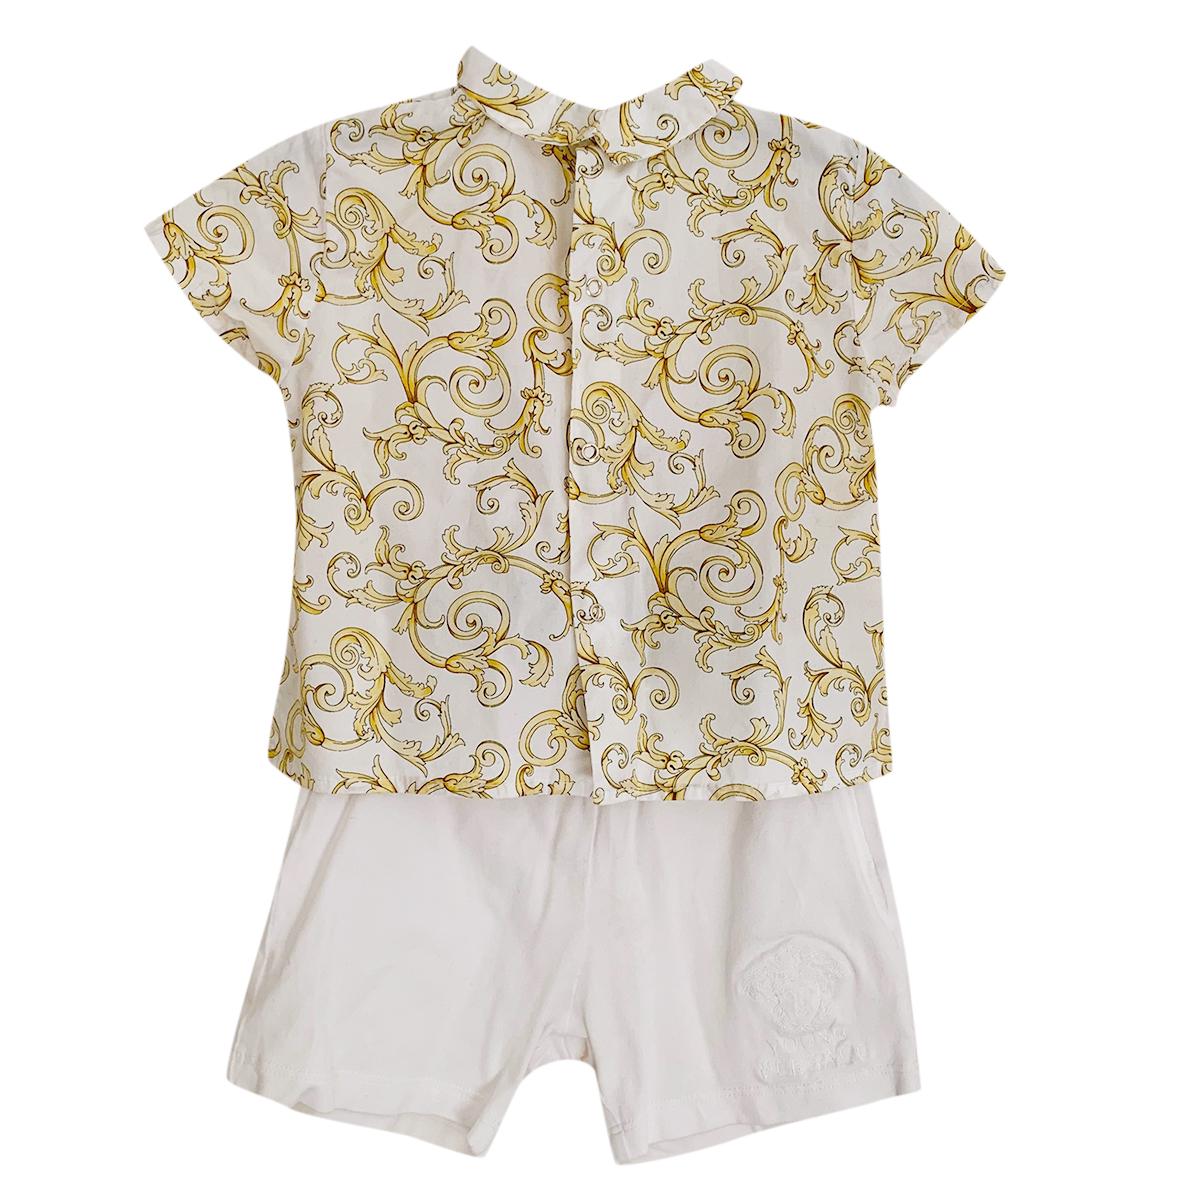 Young Versace Boys 12 months Shirt & Shorts